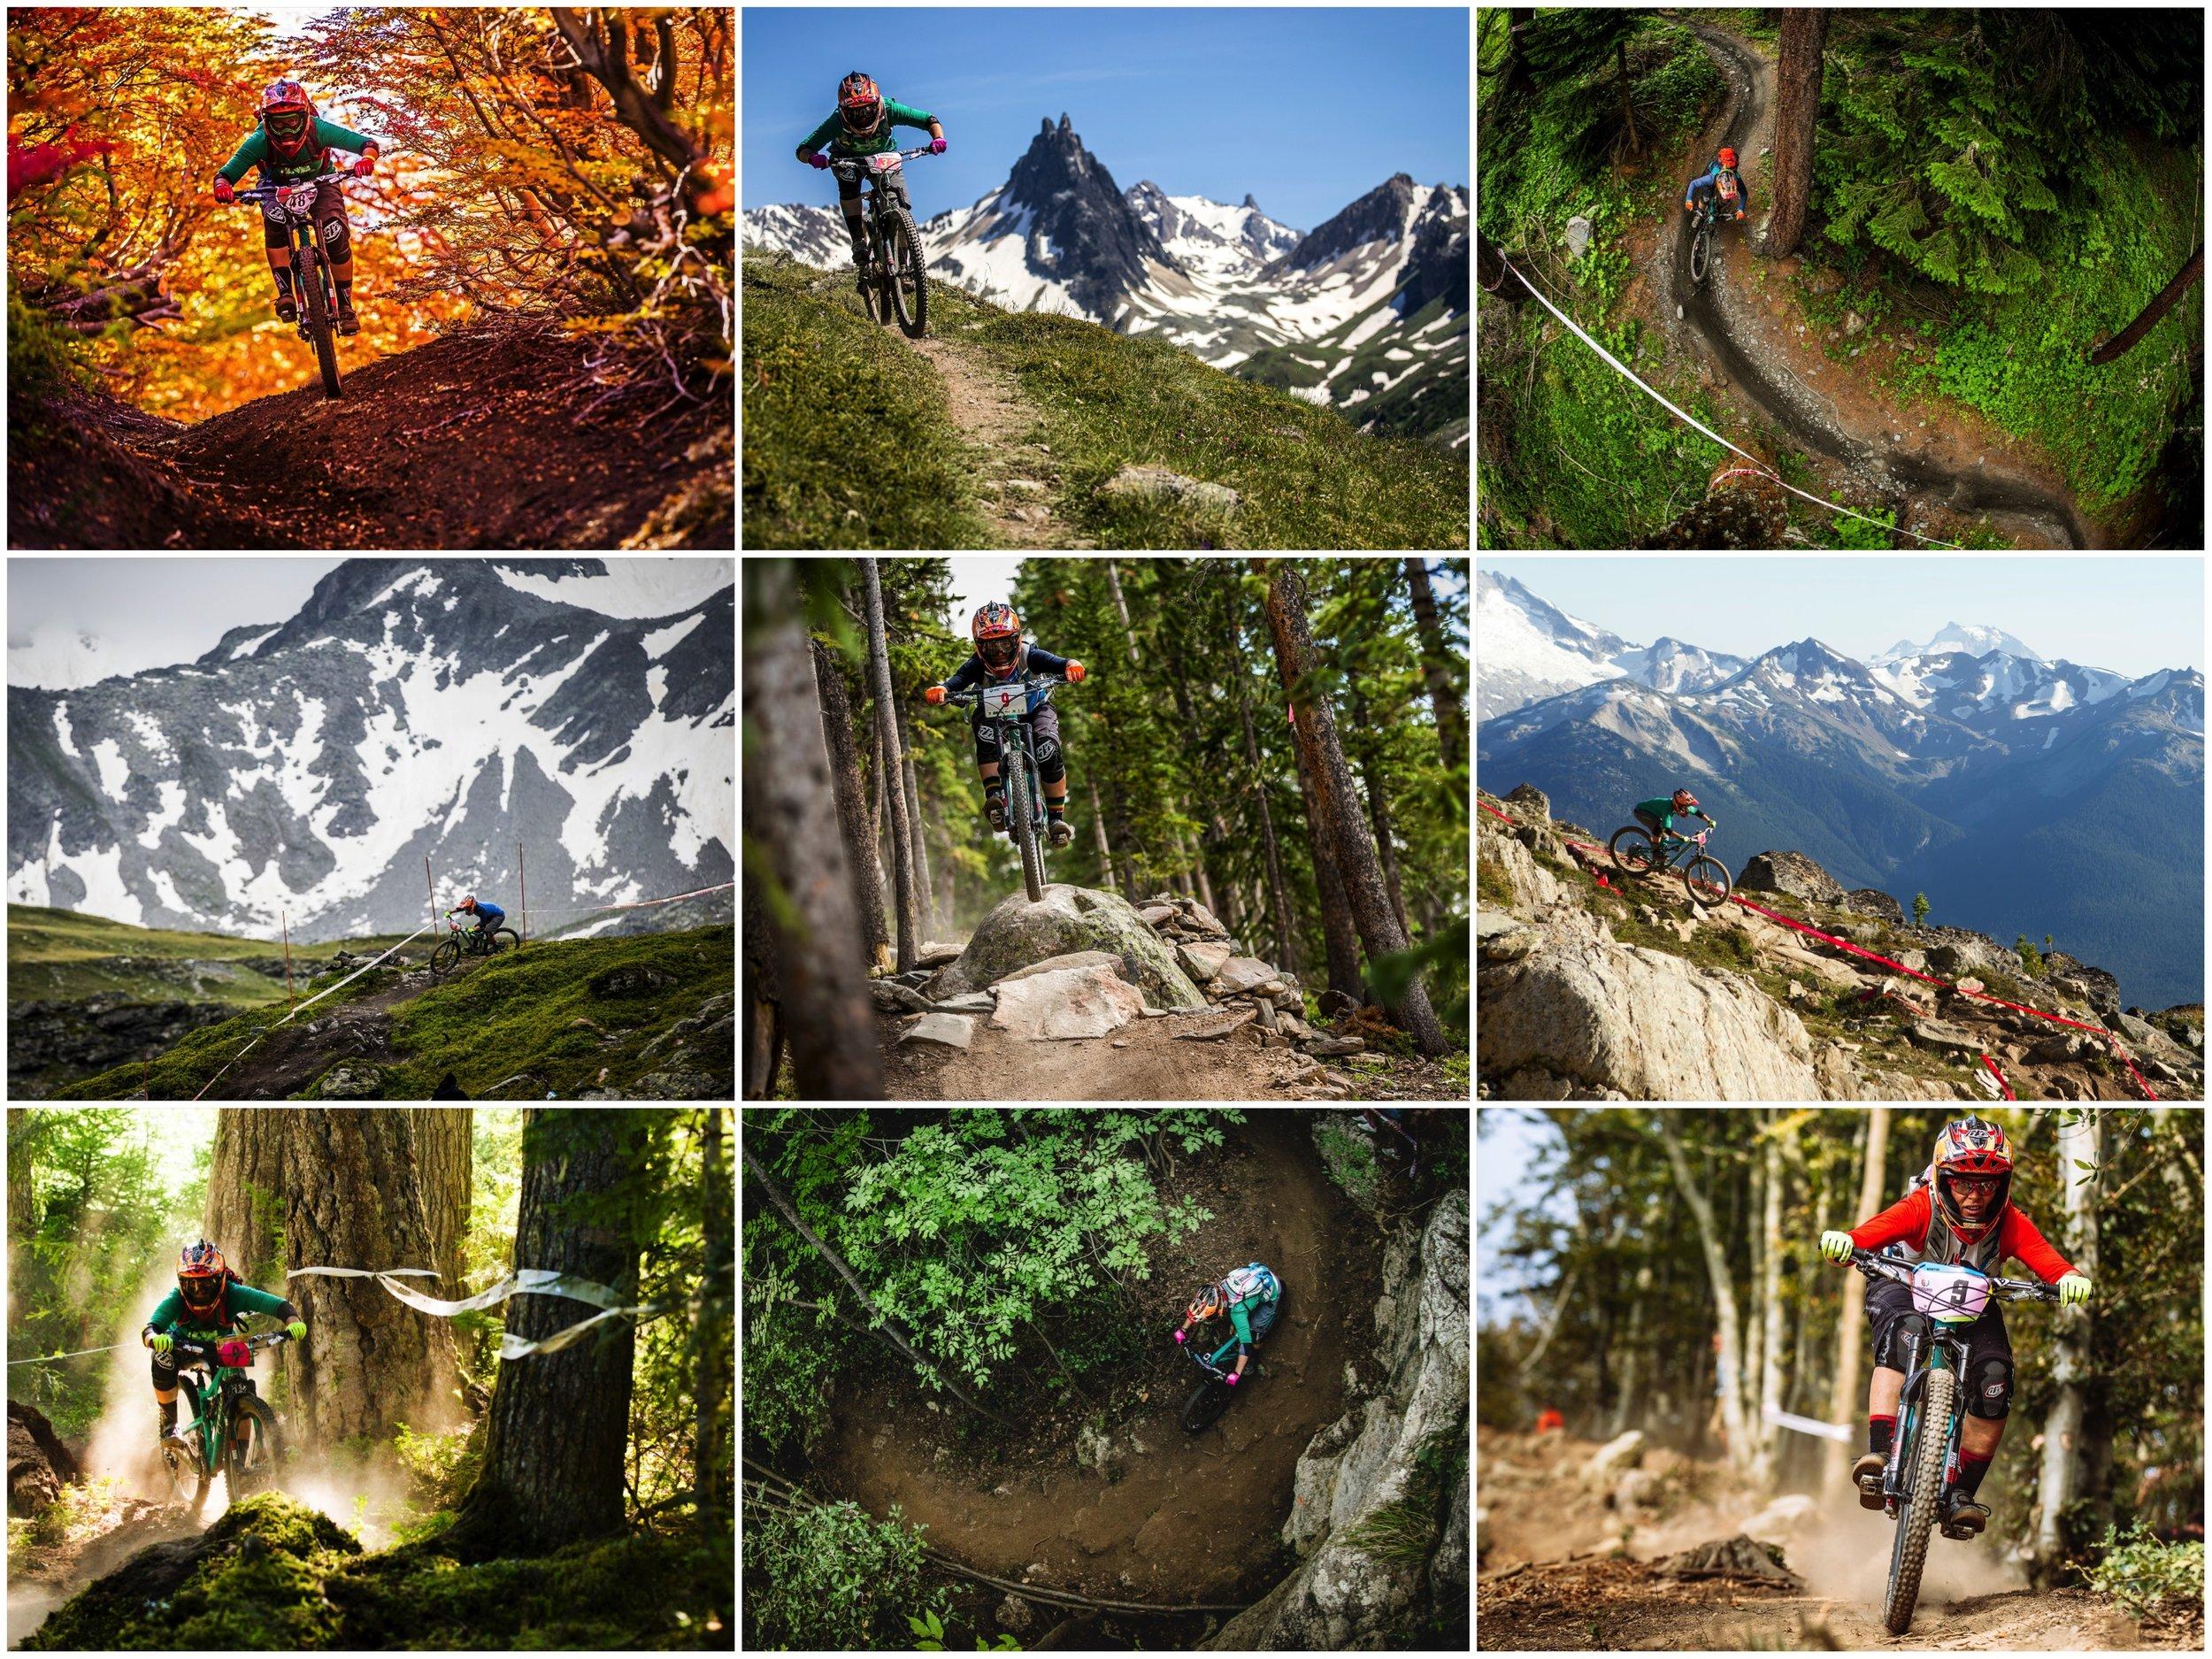 2014 EWS Season:     Chile South America, Valloir France, La Thuile Italy, Winter Park CO, Whistler Canada, Finale Ligure, Italy.